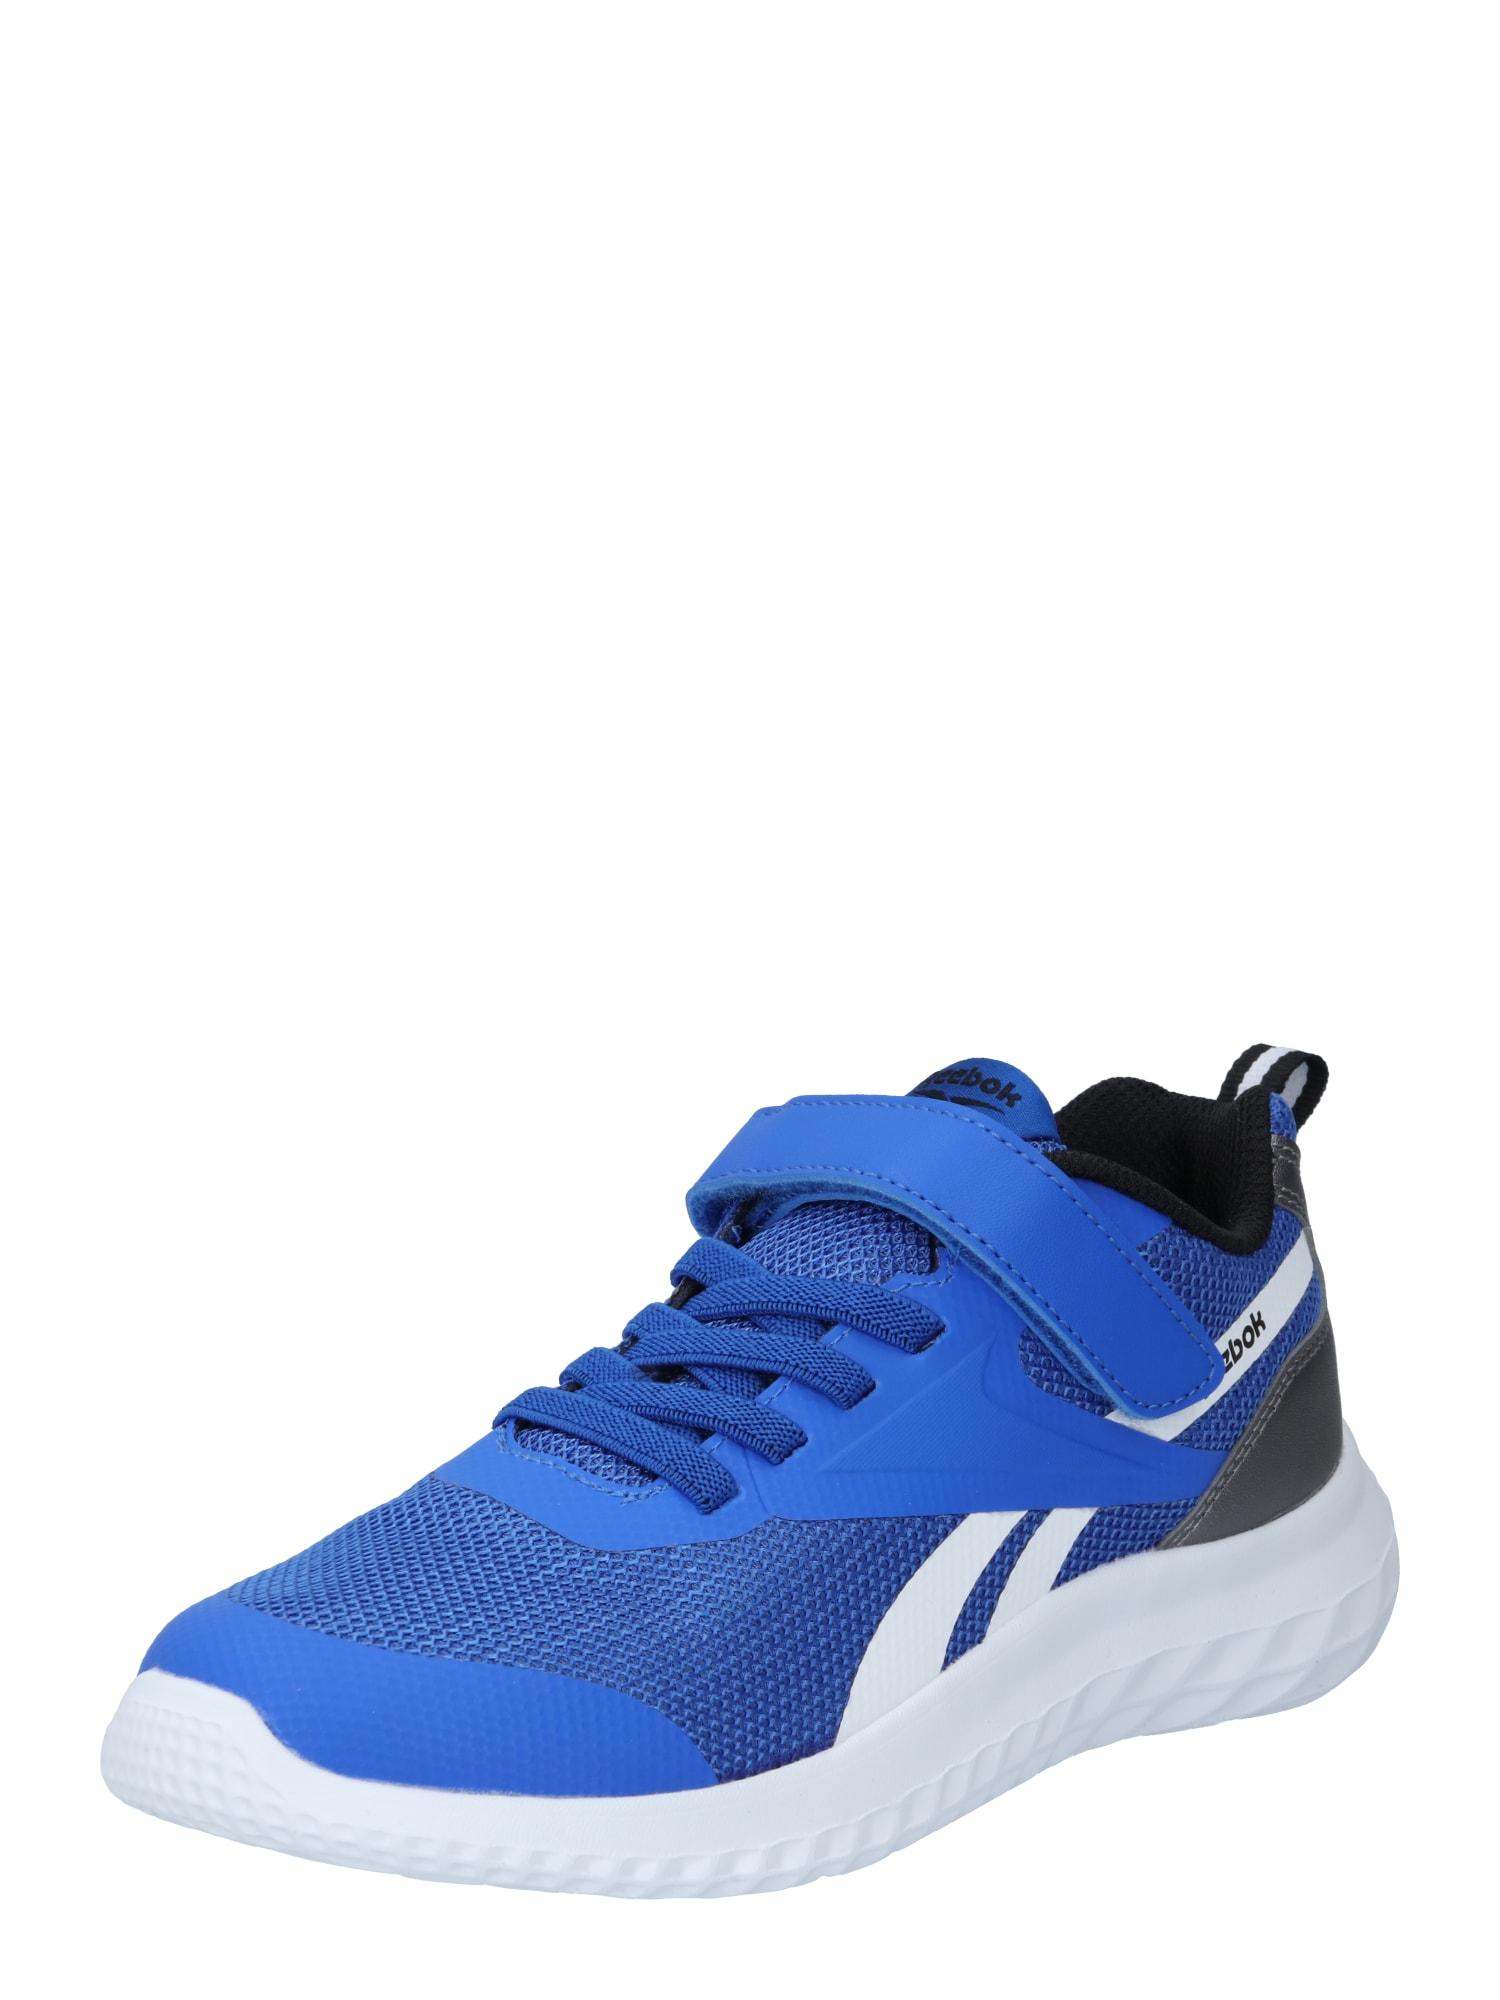 REEBOK Sportiniai batai 'Rush Runner 3.0' mėlyna / balta / pilka